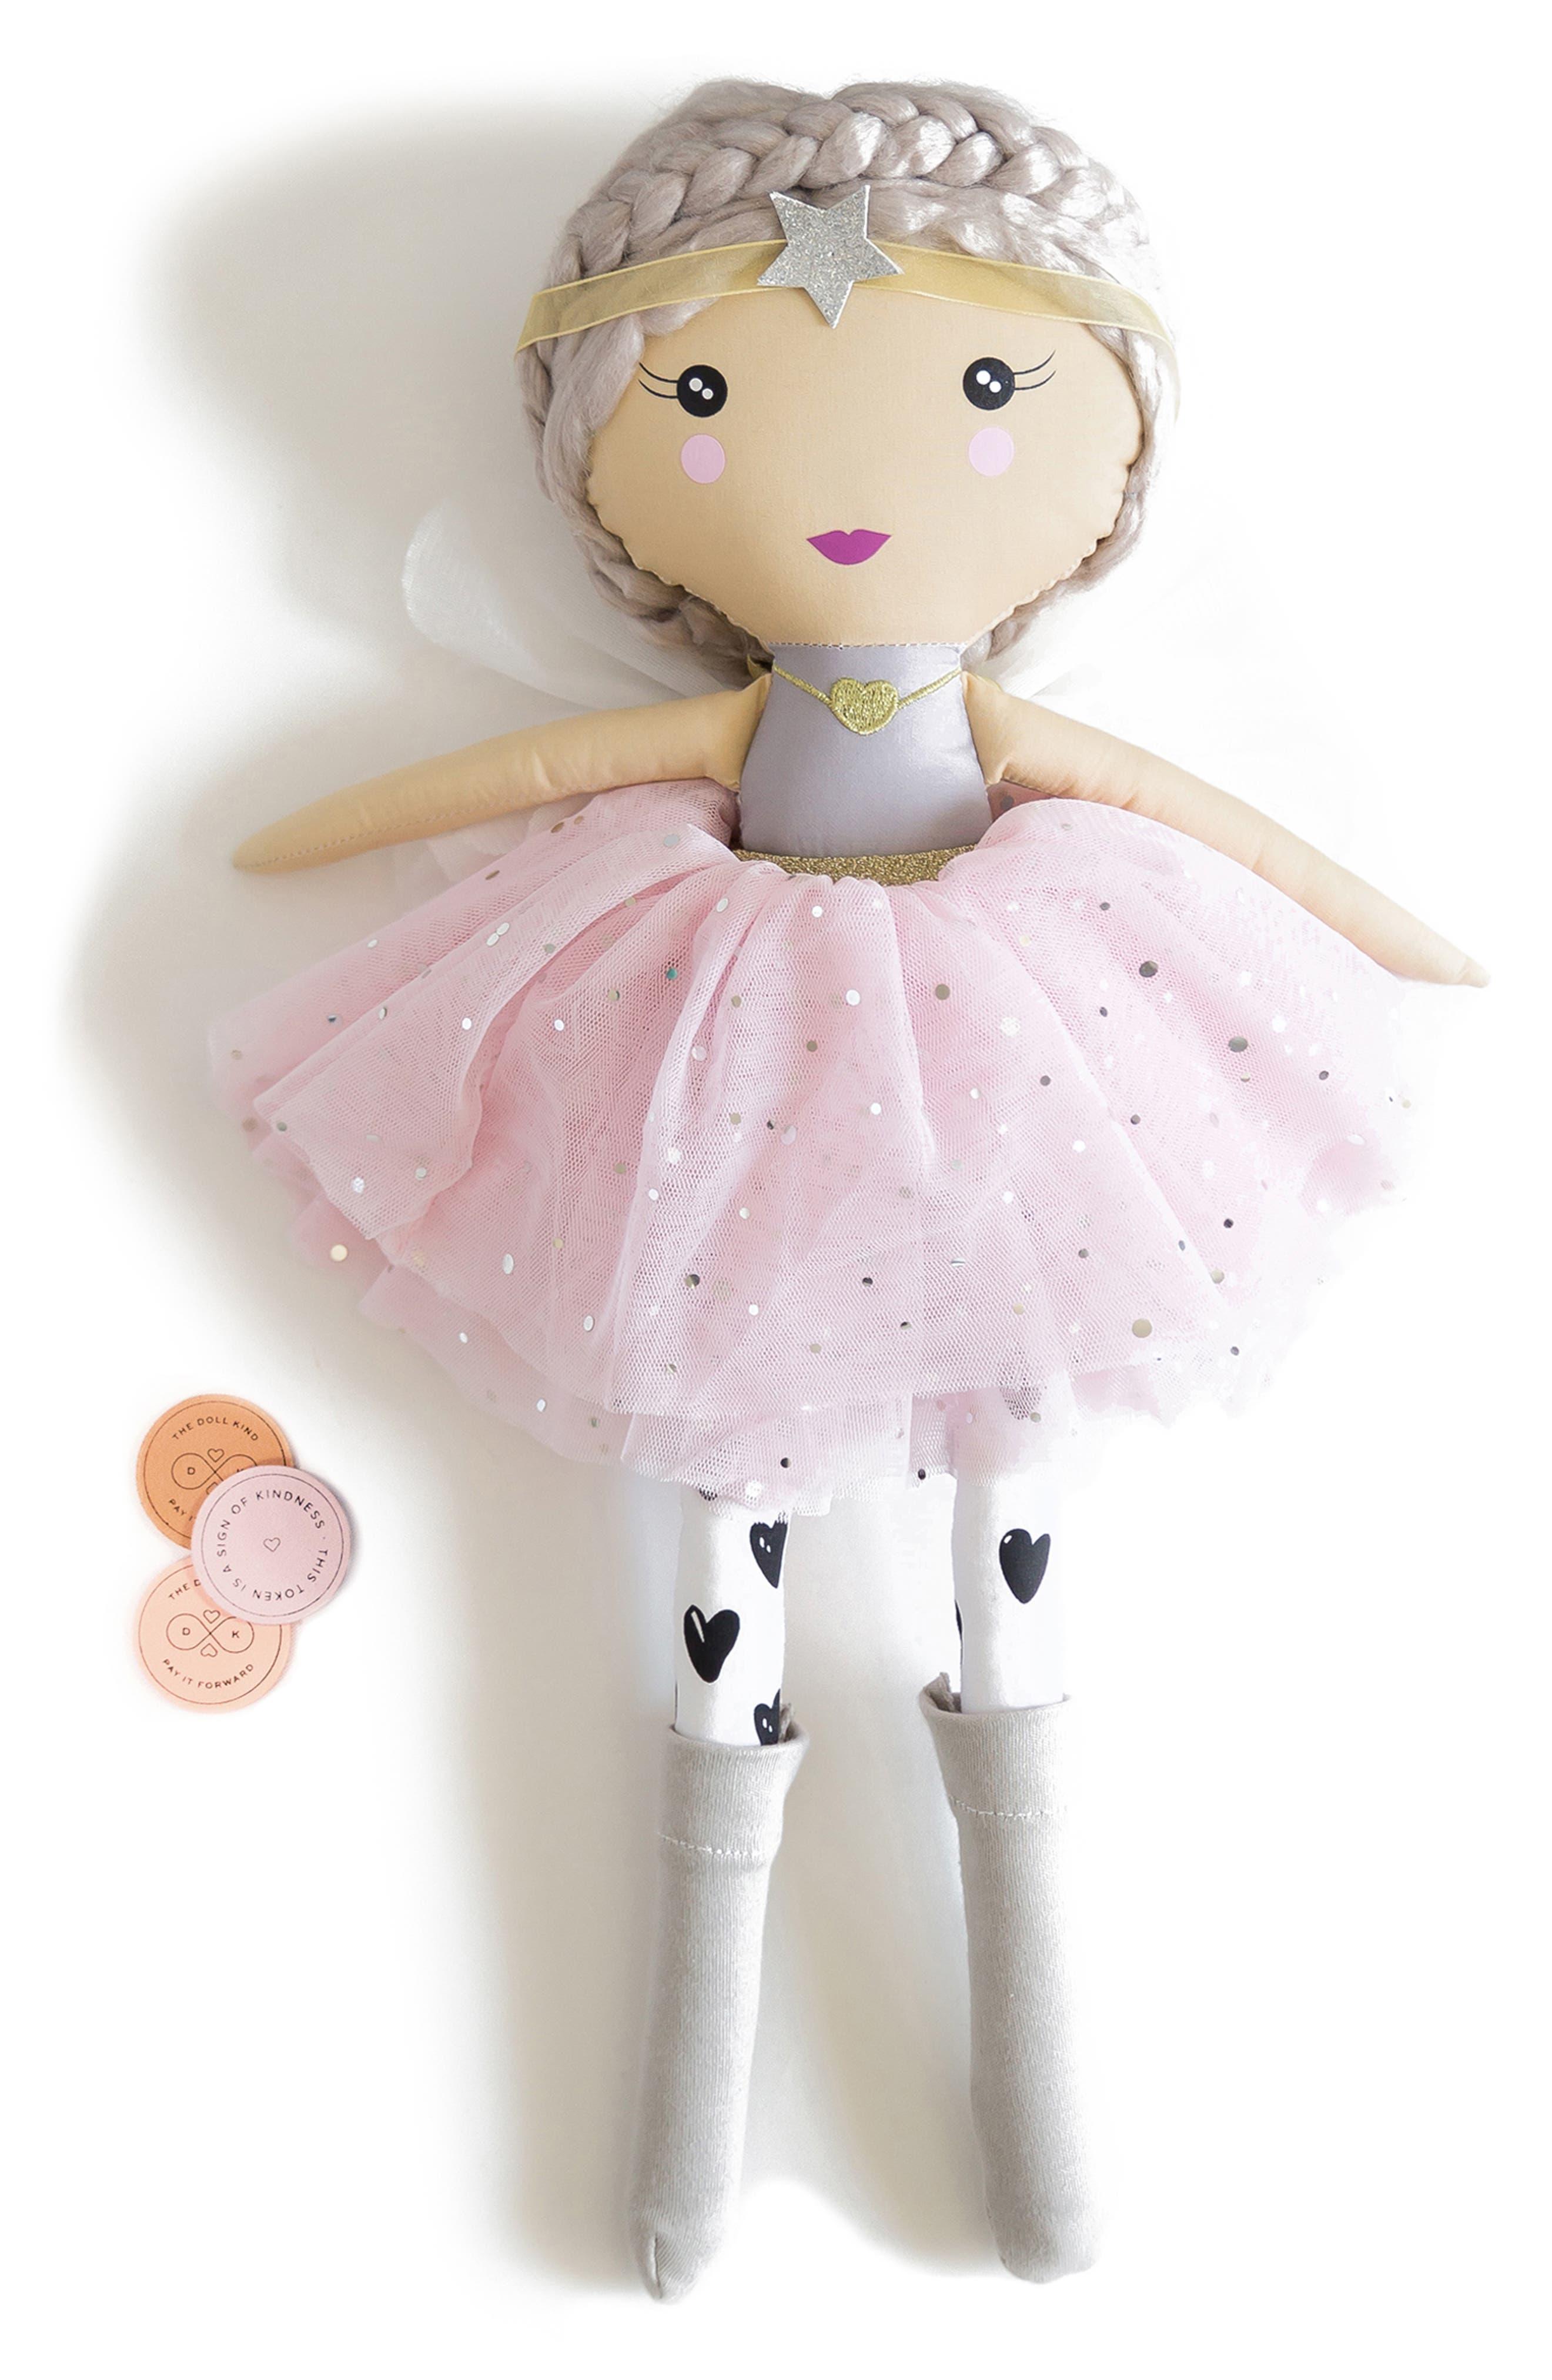 Girls Kind Culture Co The Peace Doll  Kindness Kit Set